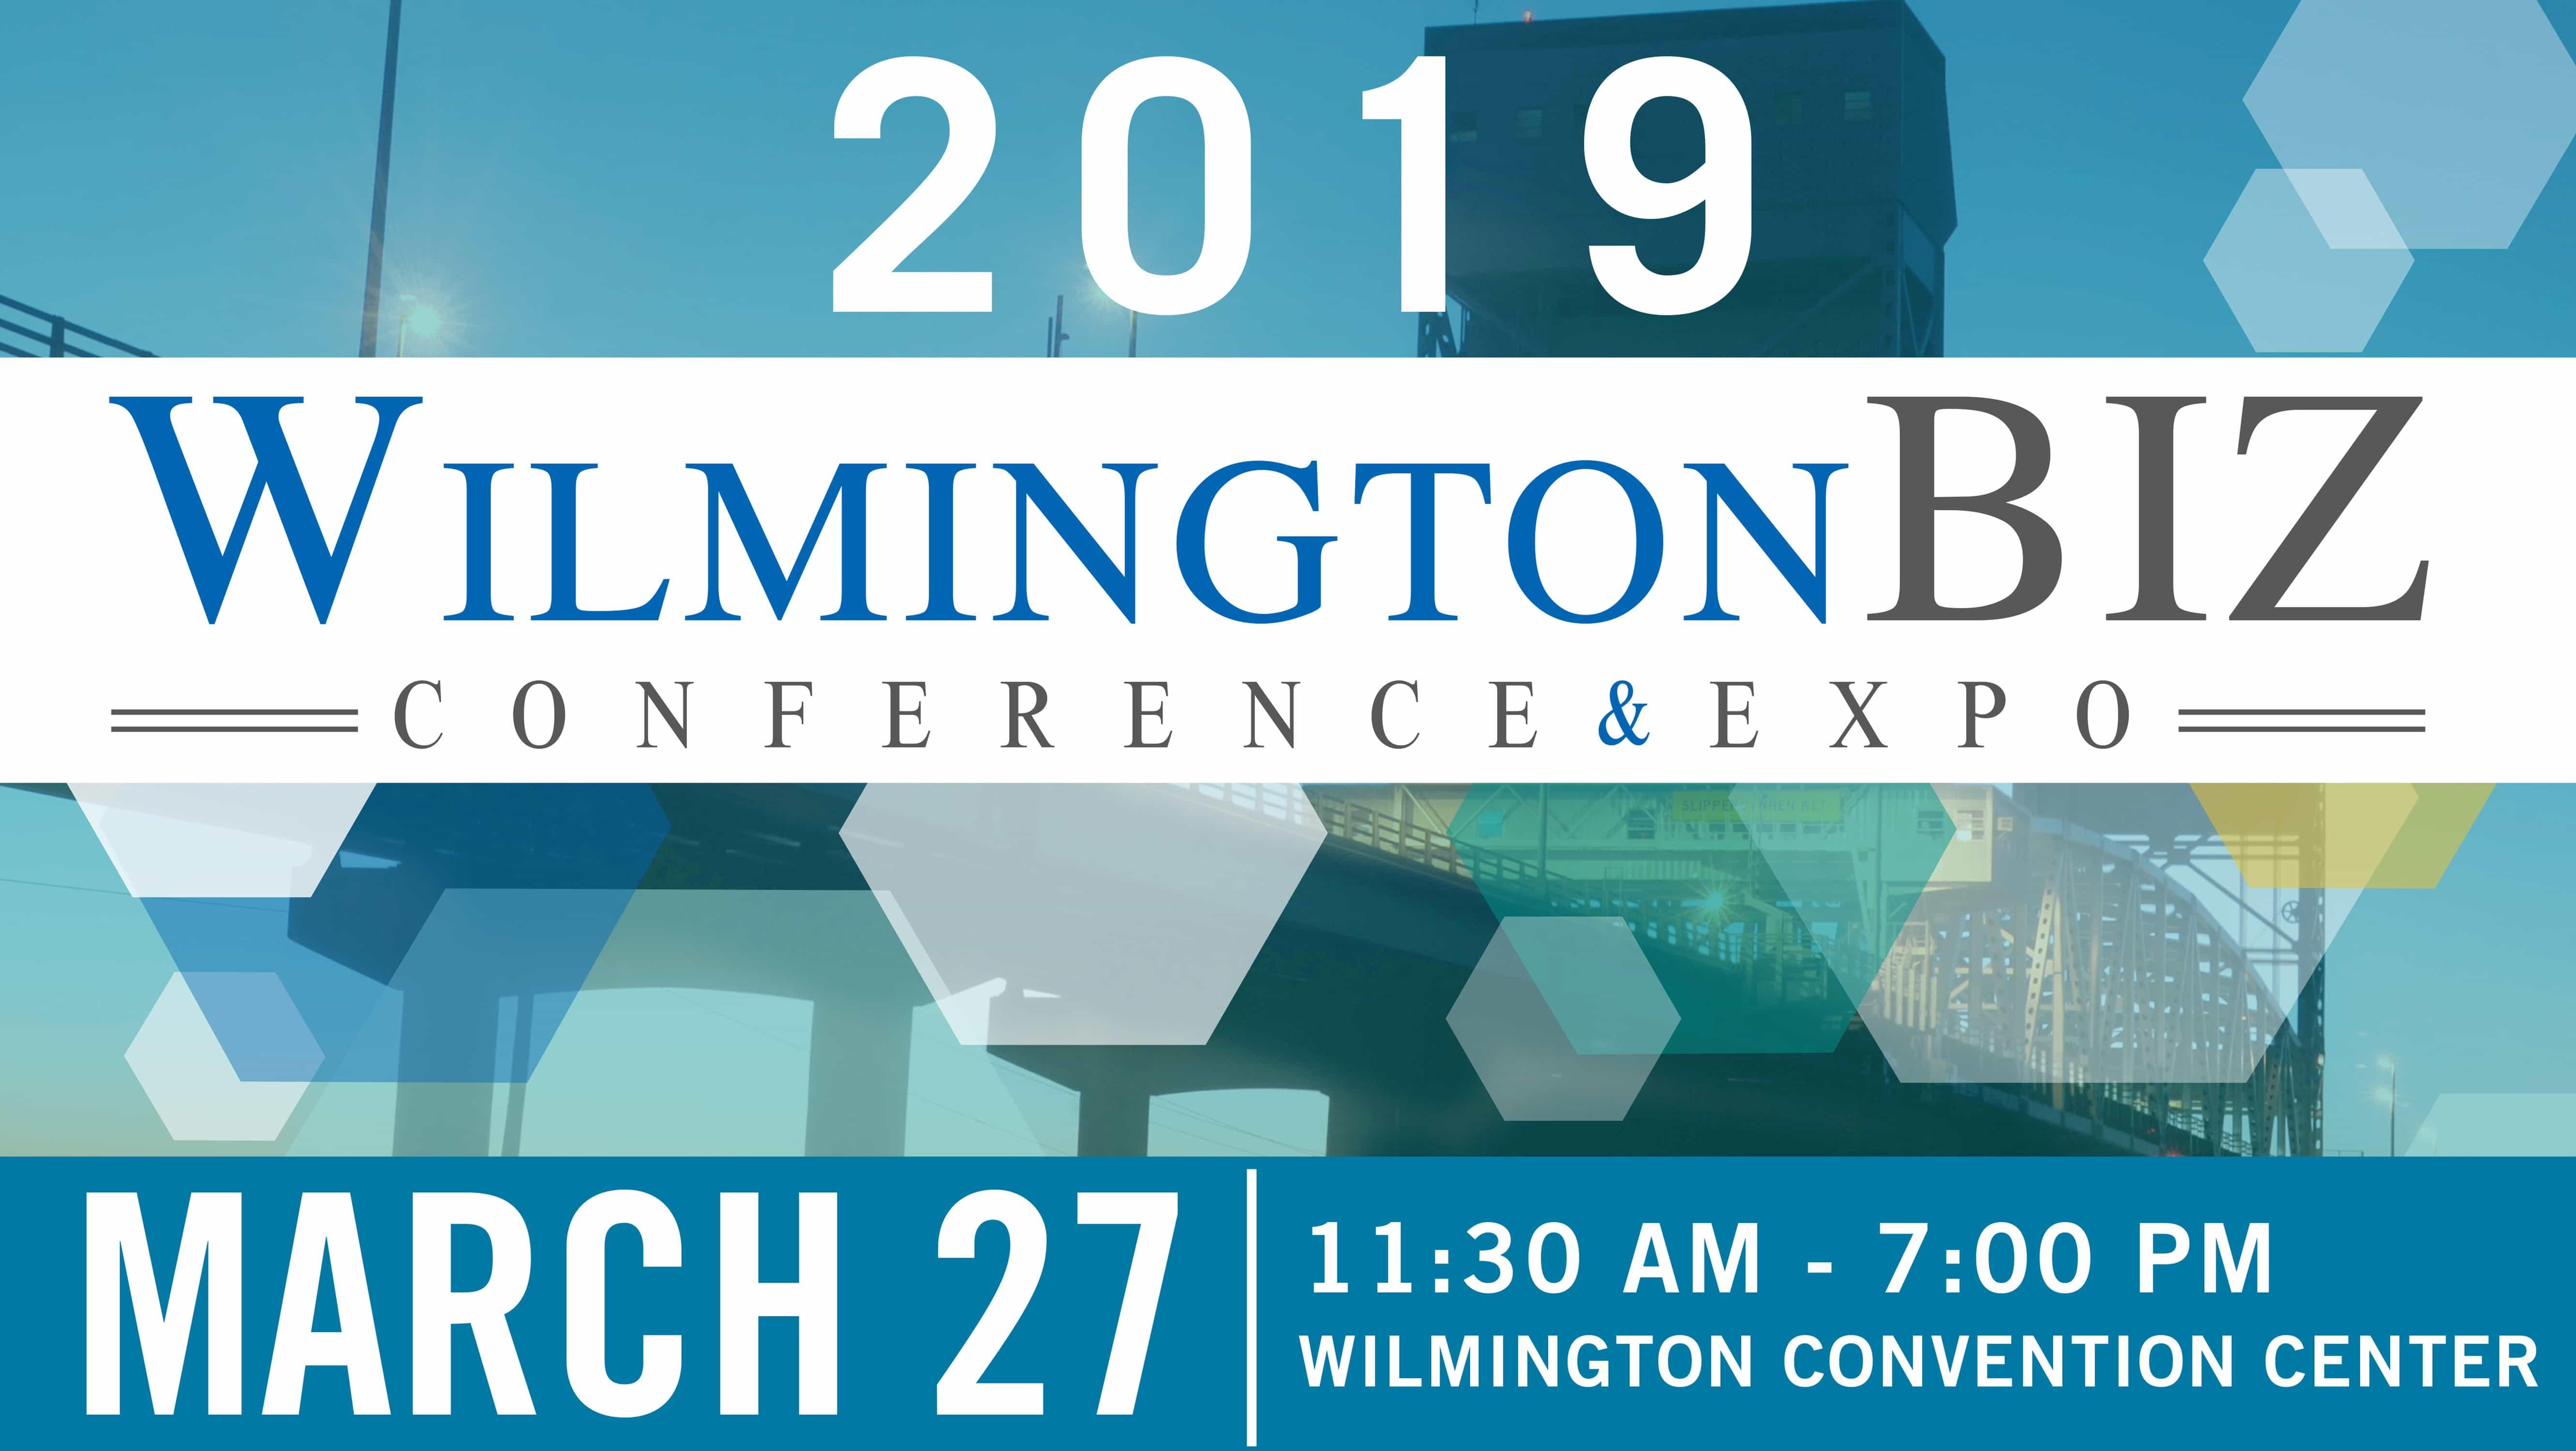 2019 WilmingtonBiz Conference & Expo - WilmingtonBiz Expo